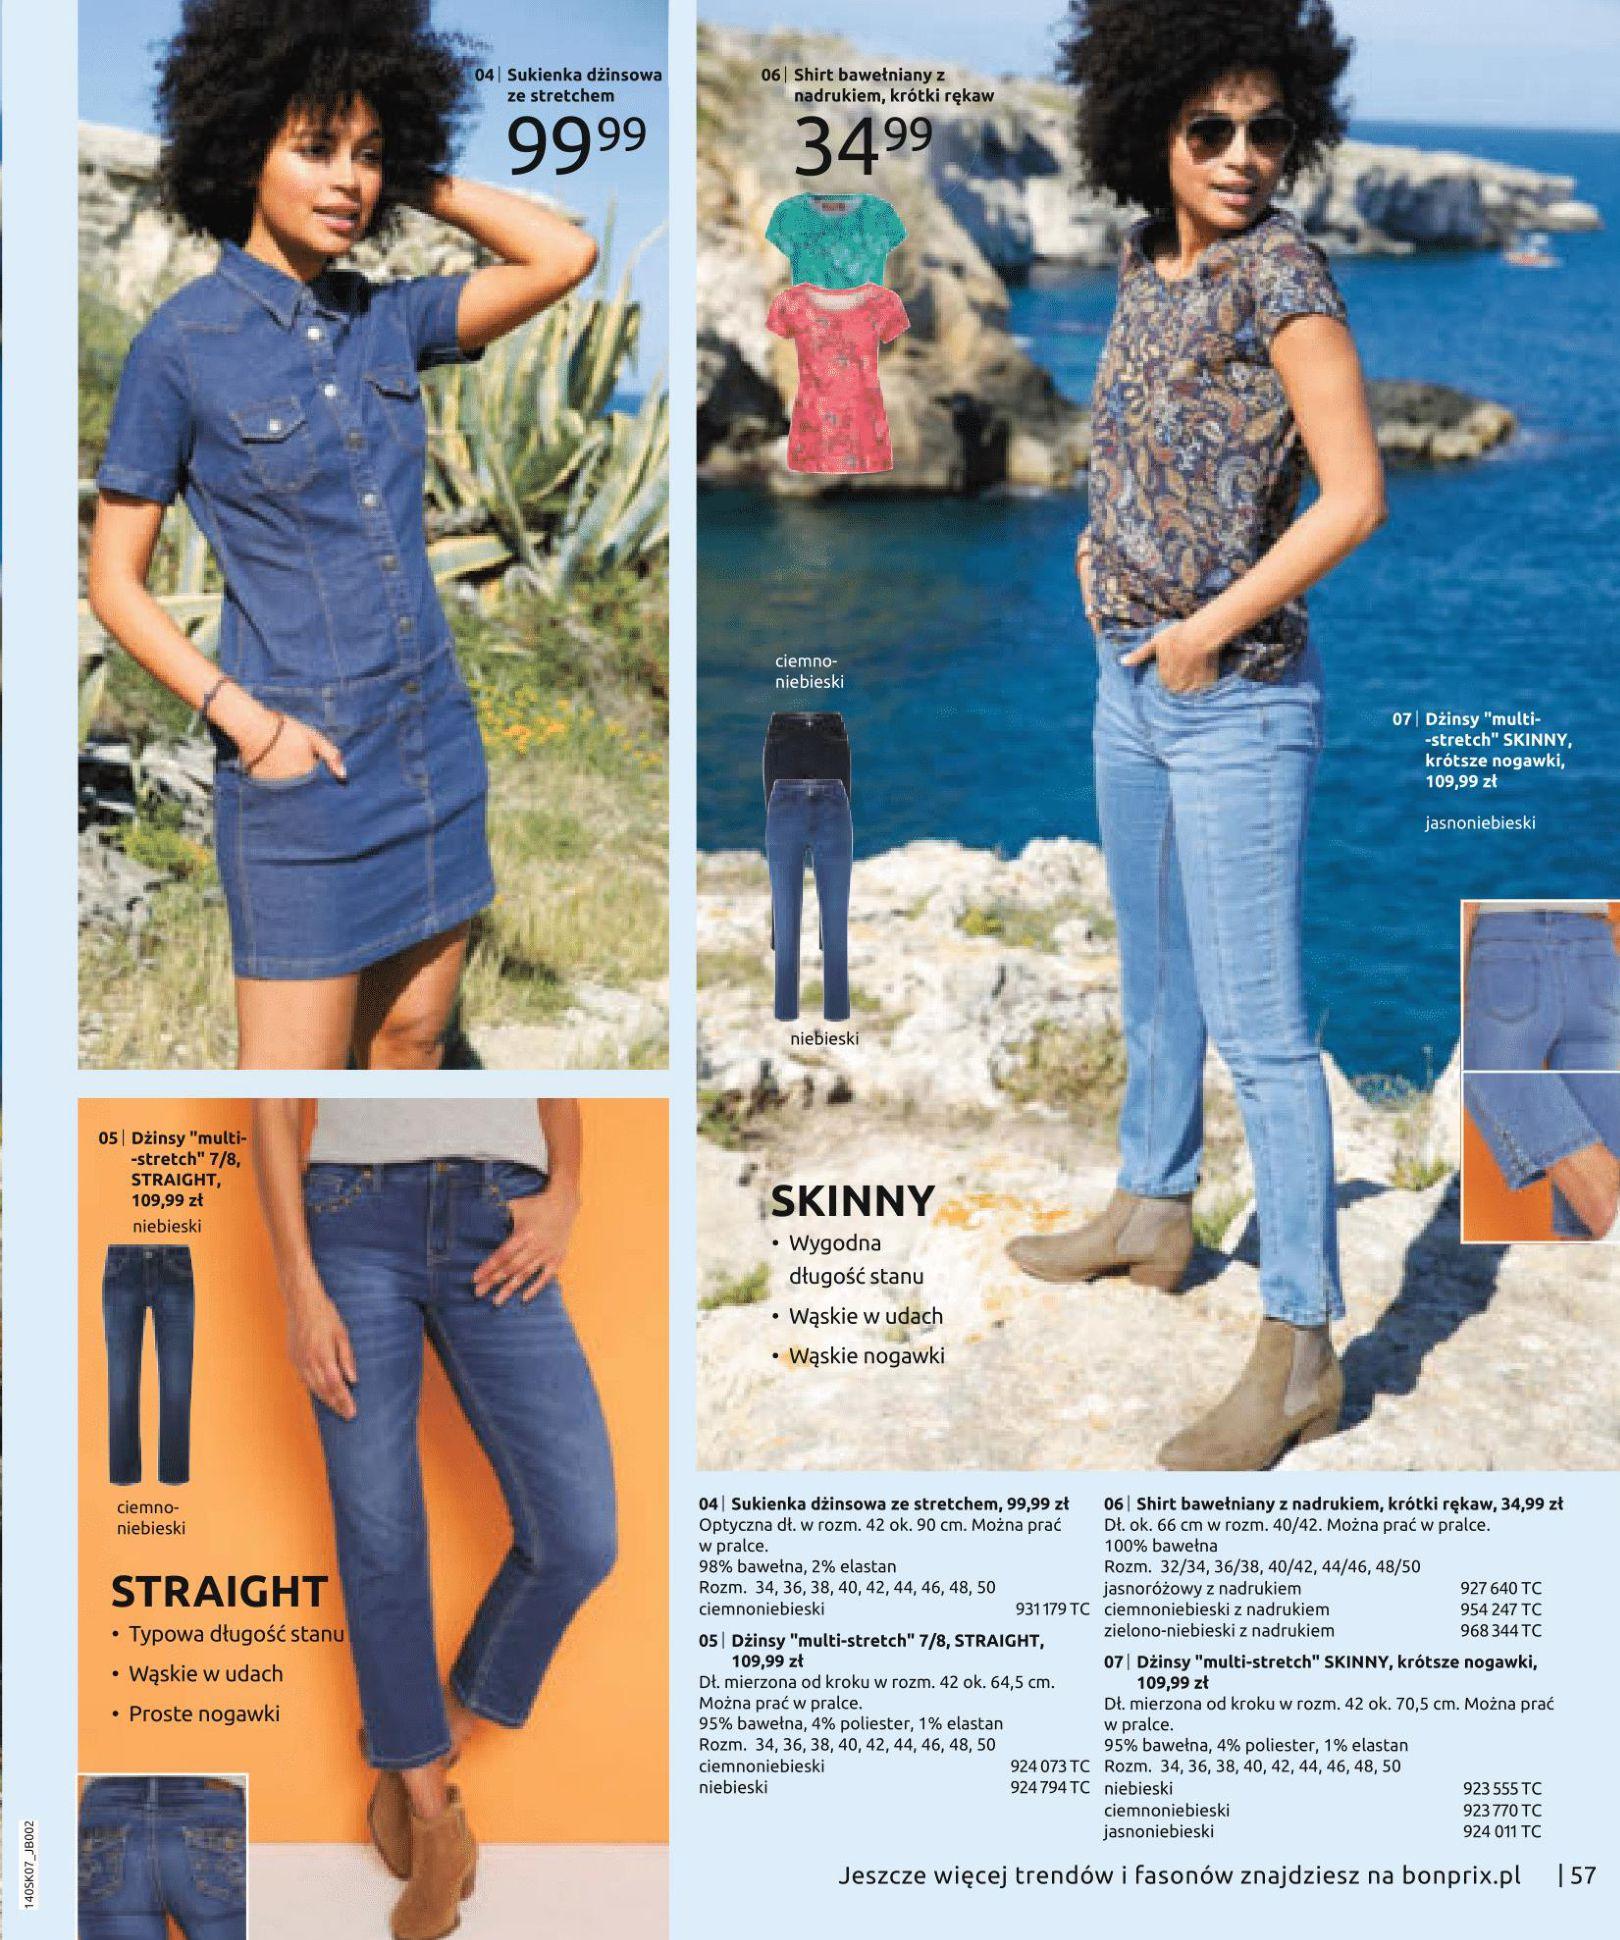 Gazetka Bonprix - Letnie trendy-02.07.2019-15.01.2020-page-59